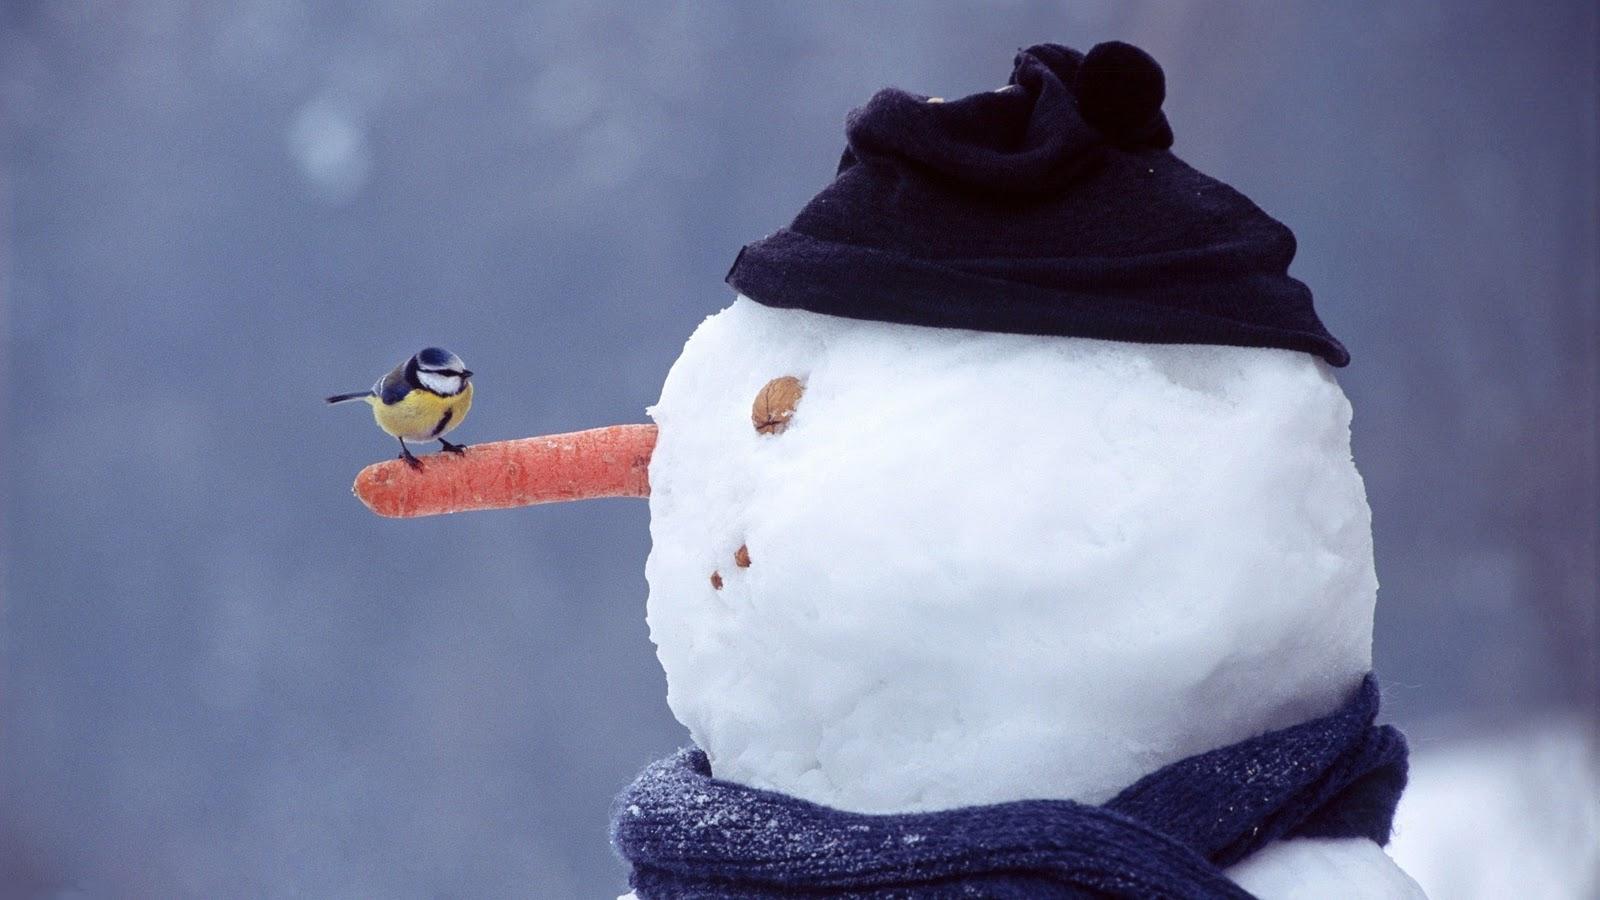 http://2.bp.blogspot.com/-3AKfteqVpWM/Tq68yk9RF8I/AAAAAAAAPsE/z3ht8r36gEM/s1600/Mooie-sneeuwpop-achtergronden-leuke-hd-sneeuwpop-wallpapers-afbeelding-plaatje-2.jpg